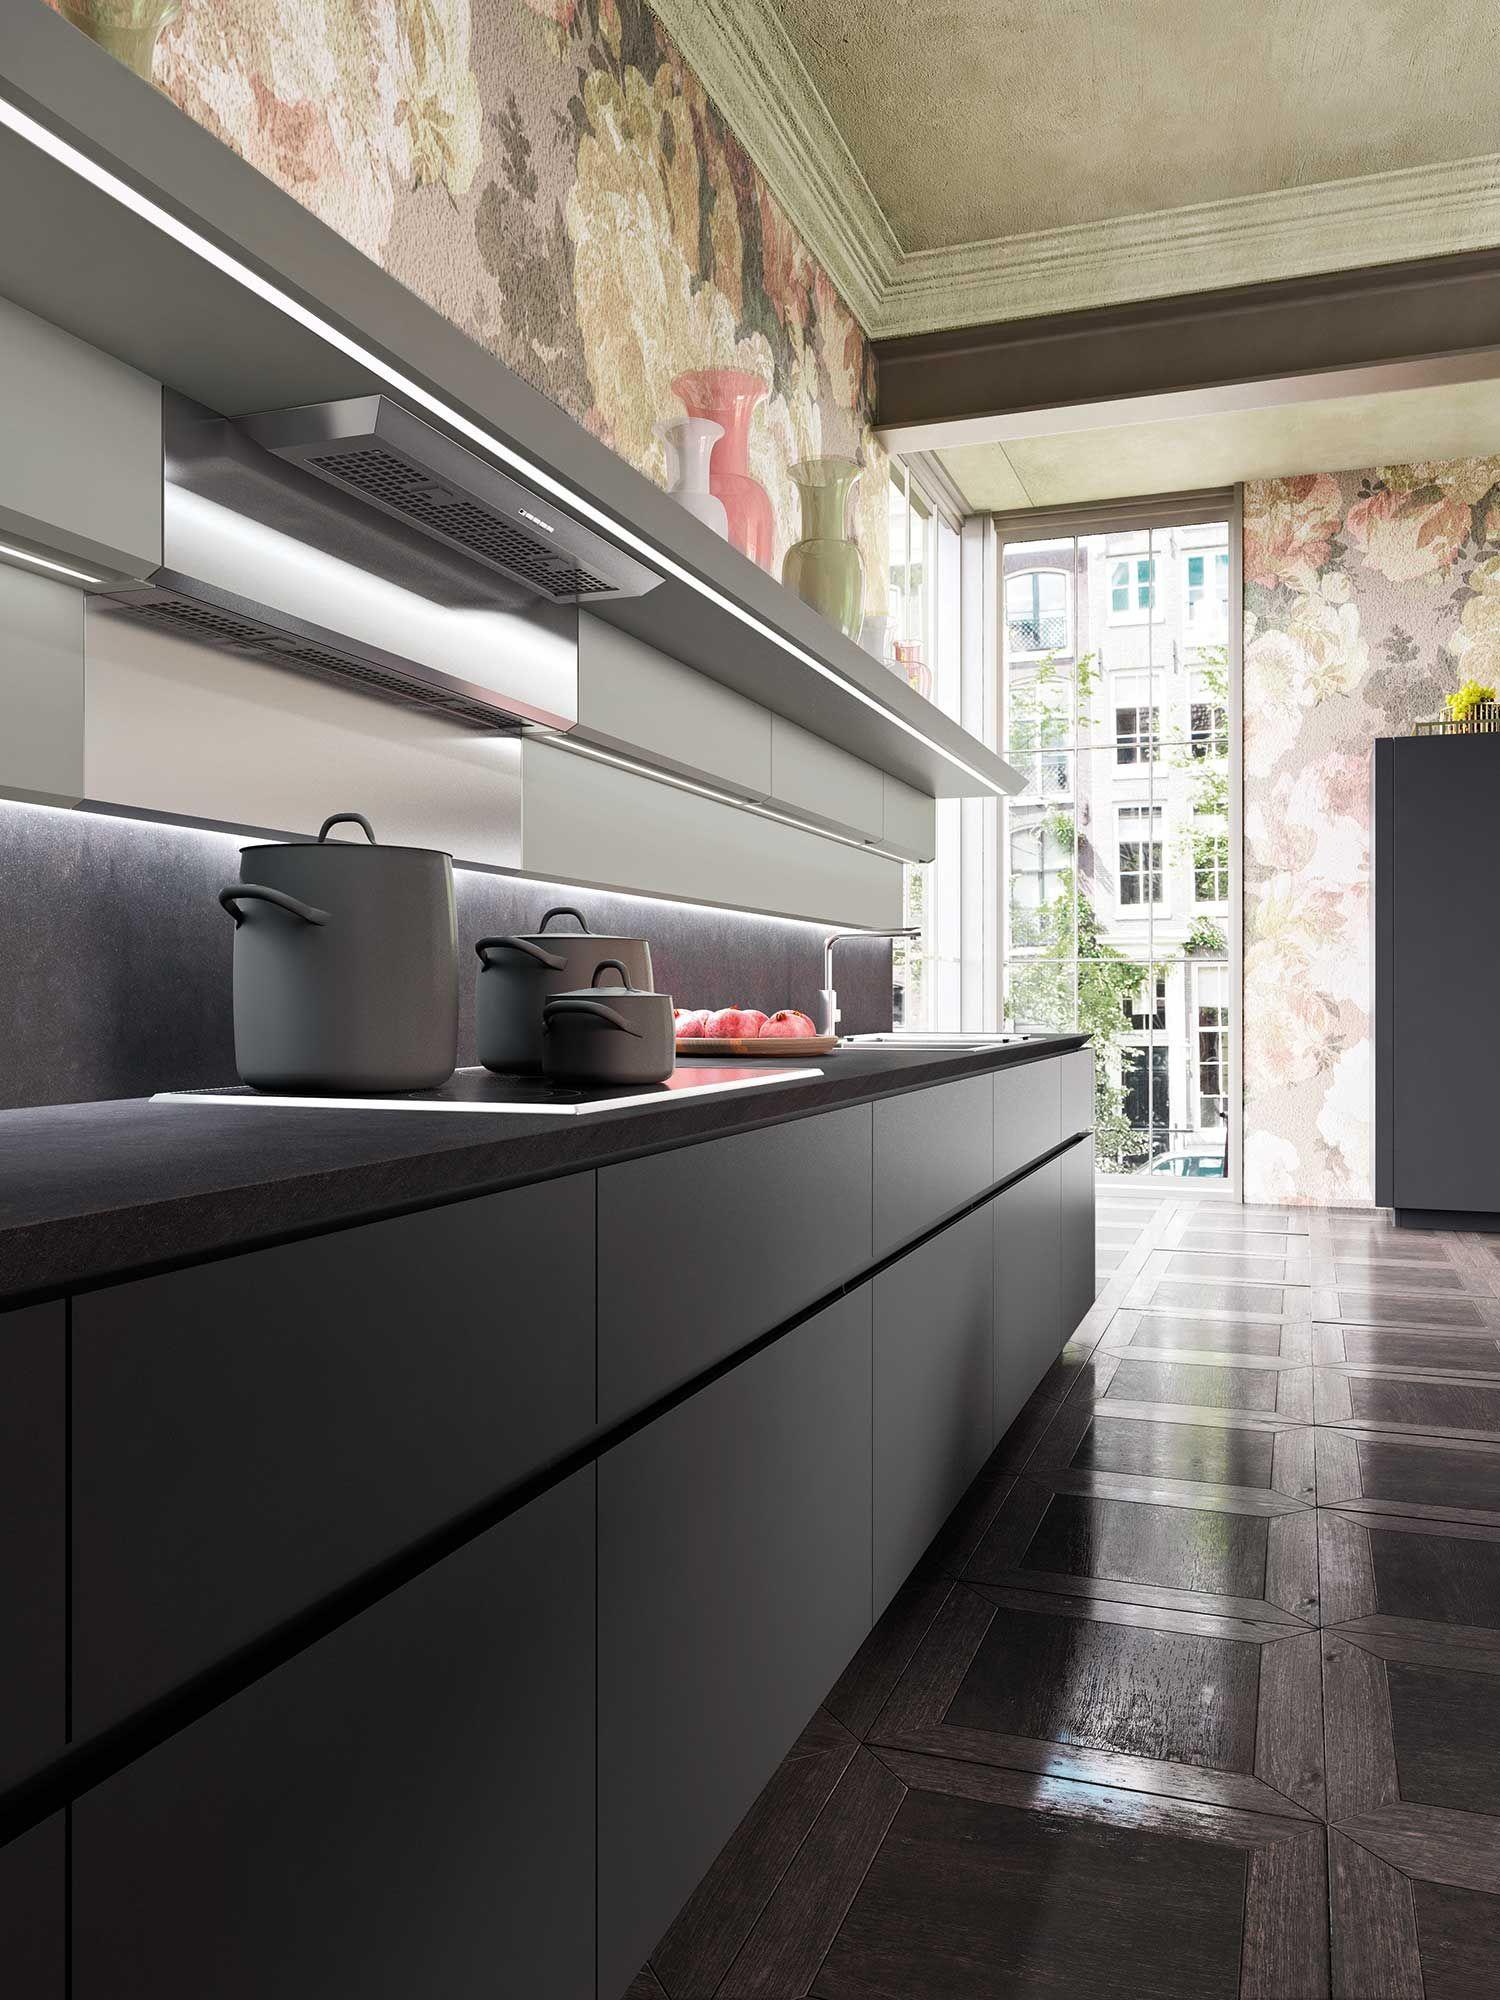 Großartig Küche Idea Pics Zeitgenössisch - Küche Set Ideen ...